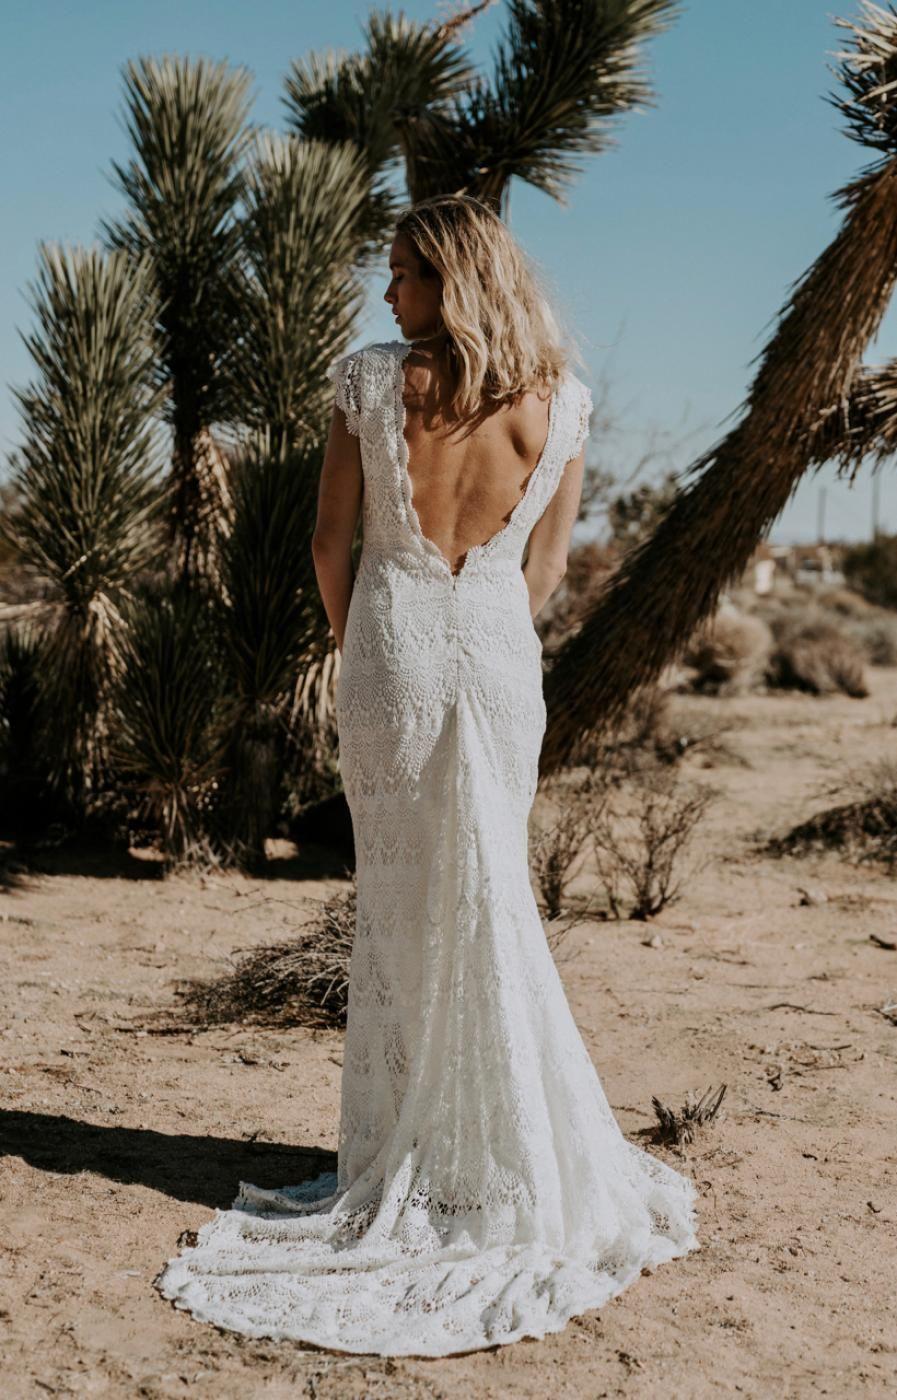 Vintage inspired lace wedding dresses  Lilah  Wedding  Pinterest  Lace wedding dresses Lace weddings